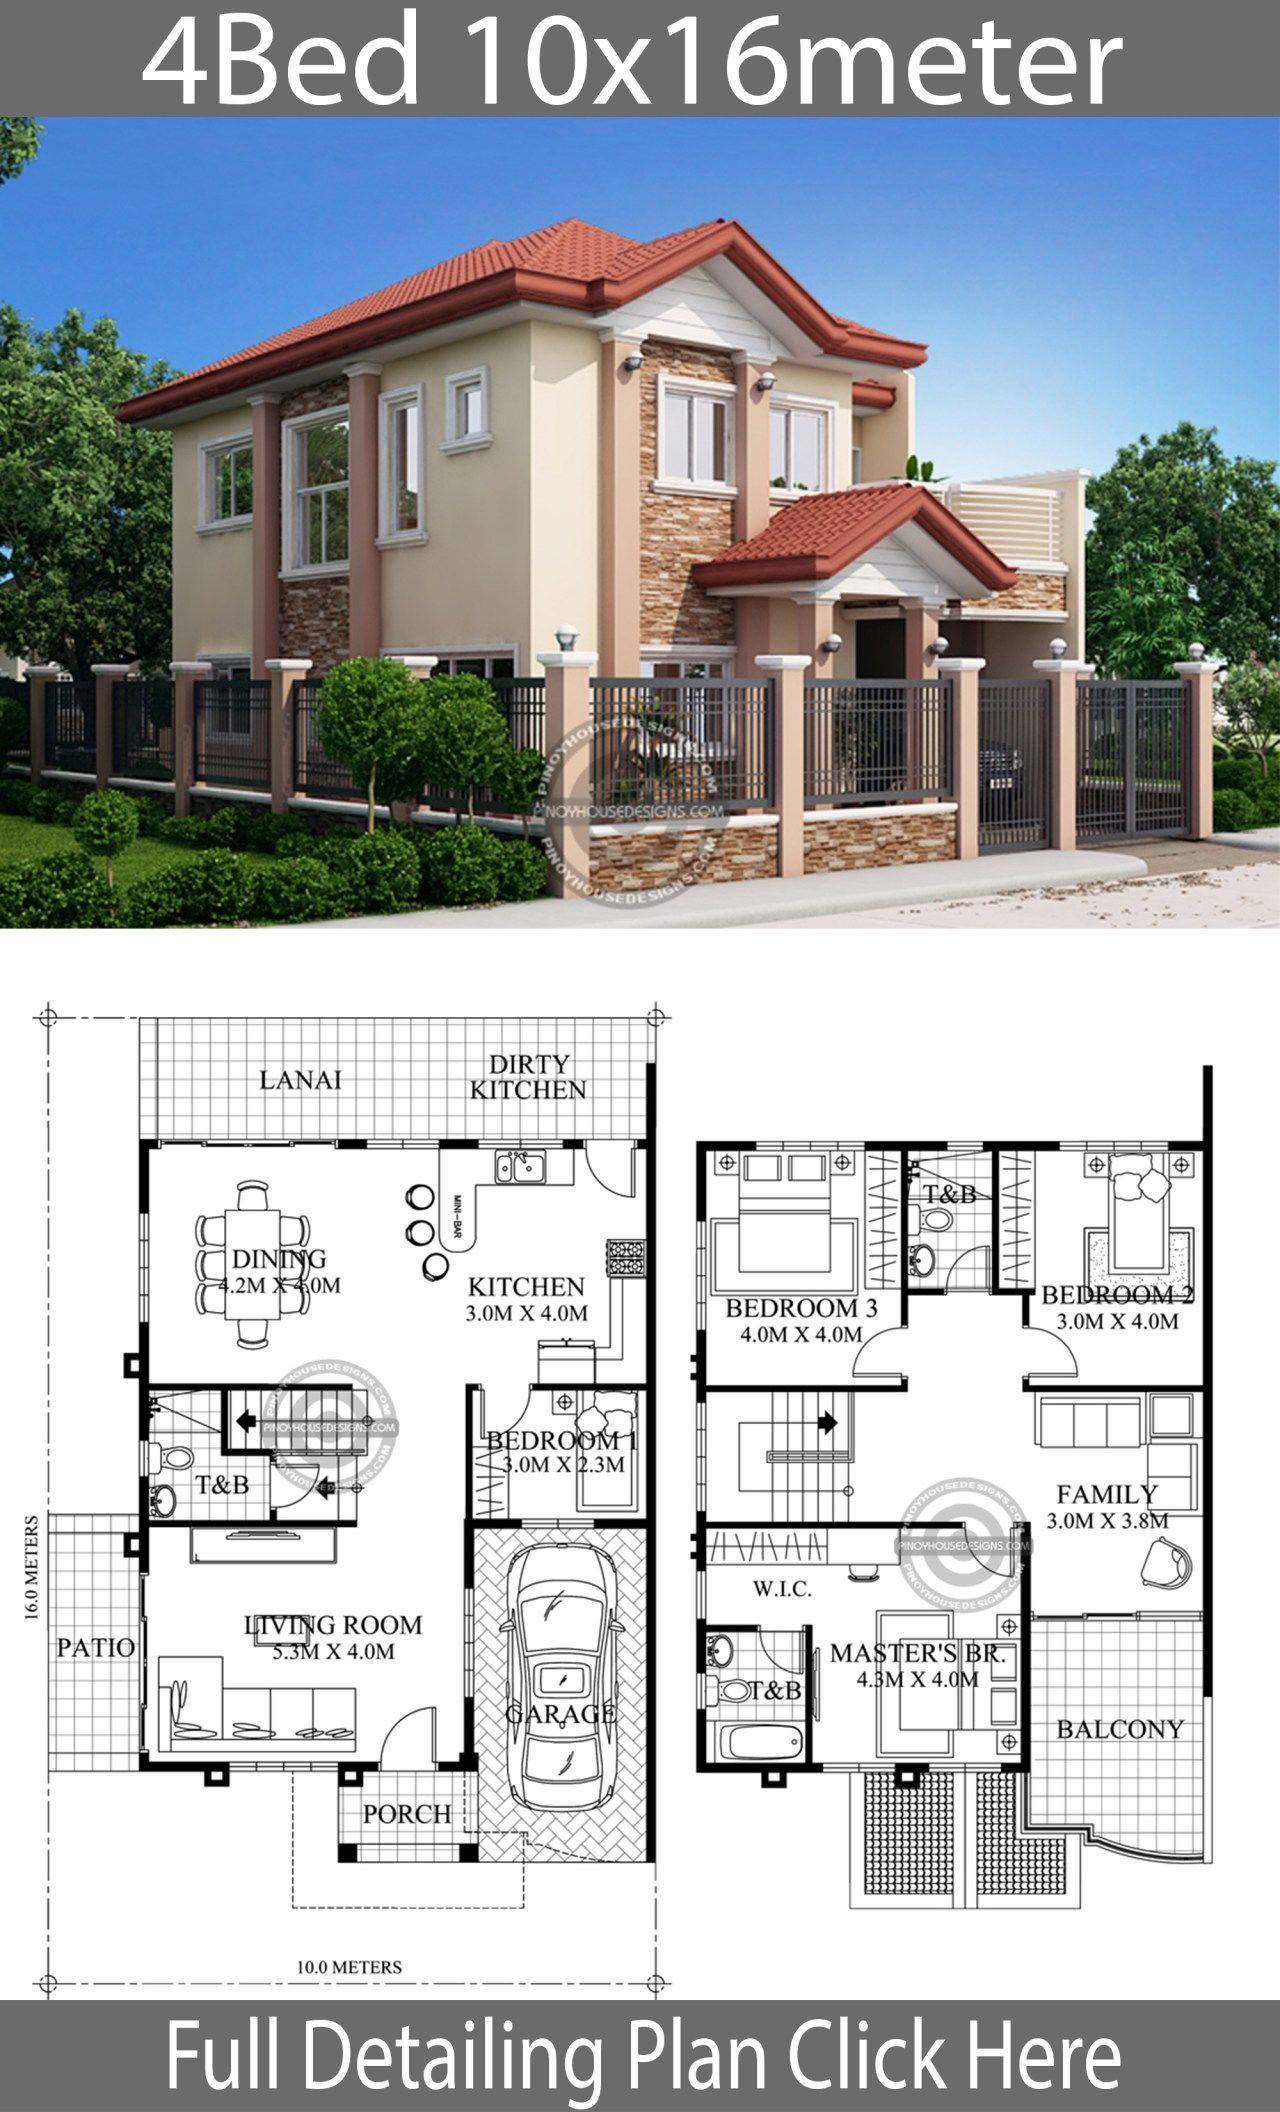 Home Design 10x16m 4 Bedrooms Home Ideas House Plans House Layout Plans Home Building Design